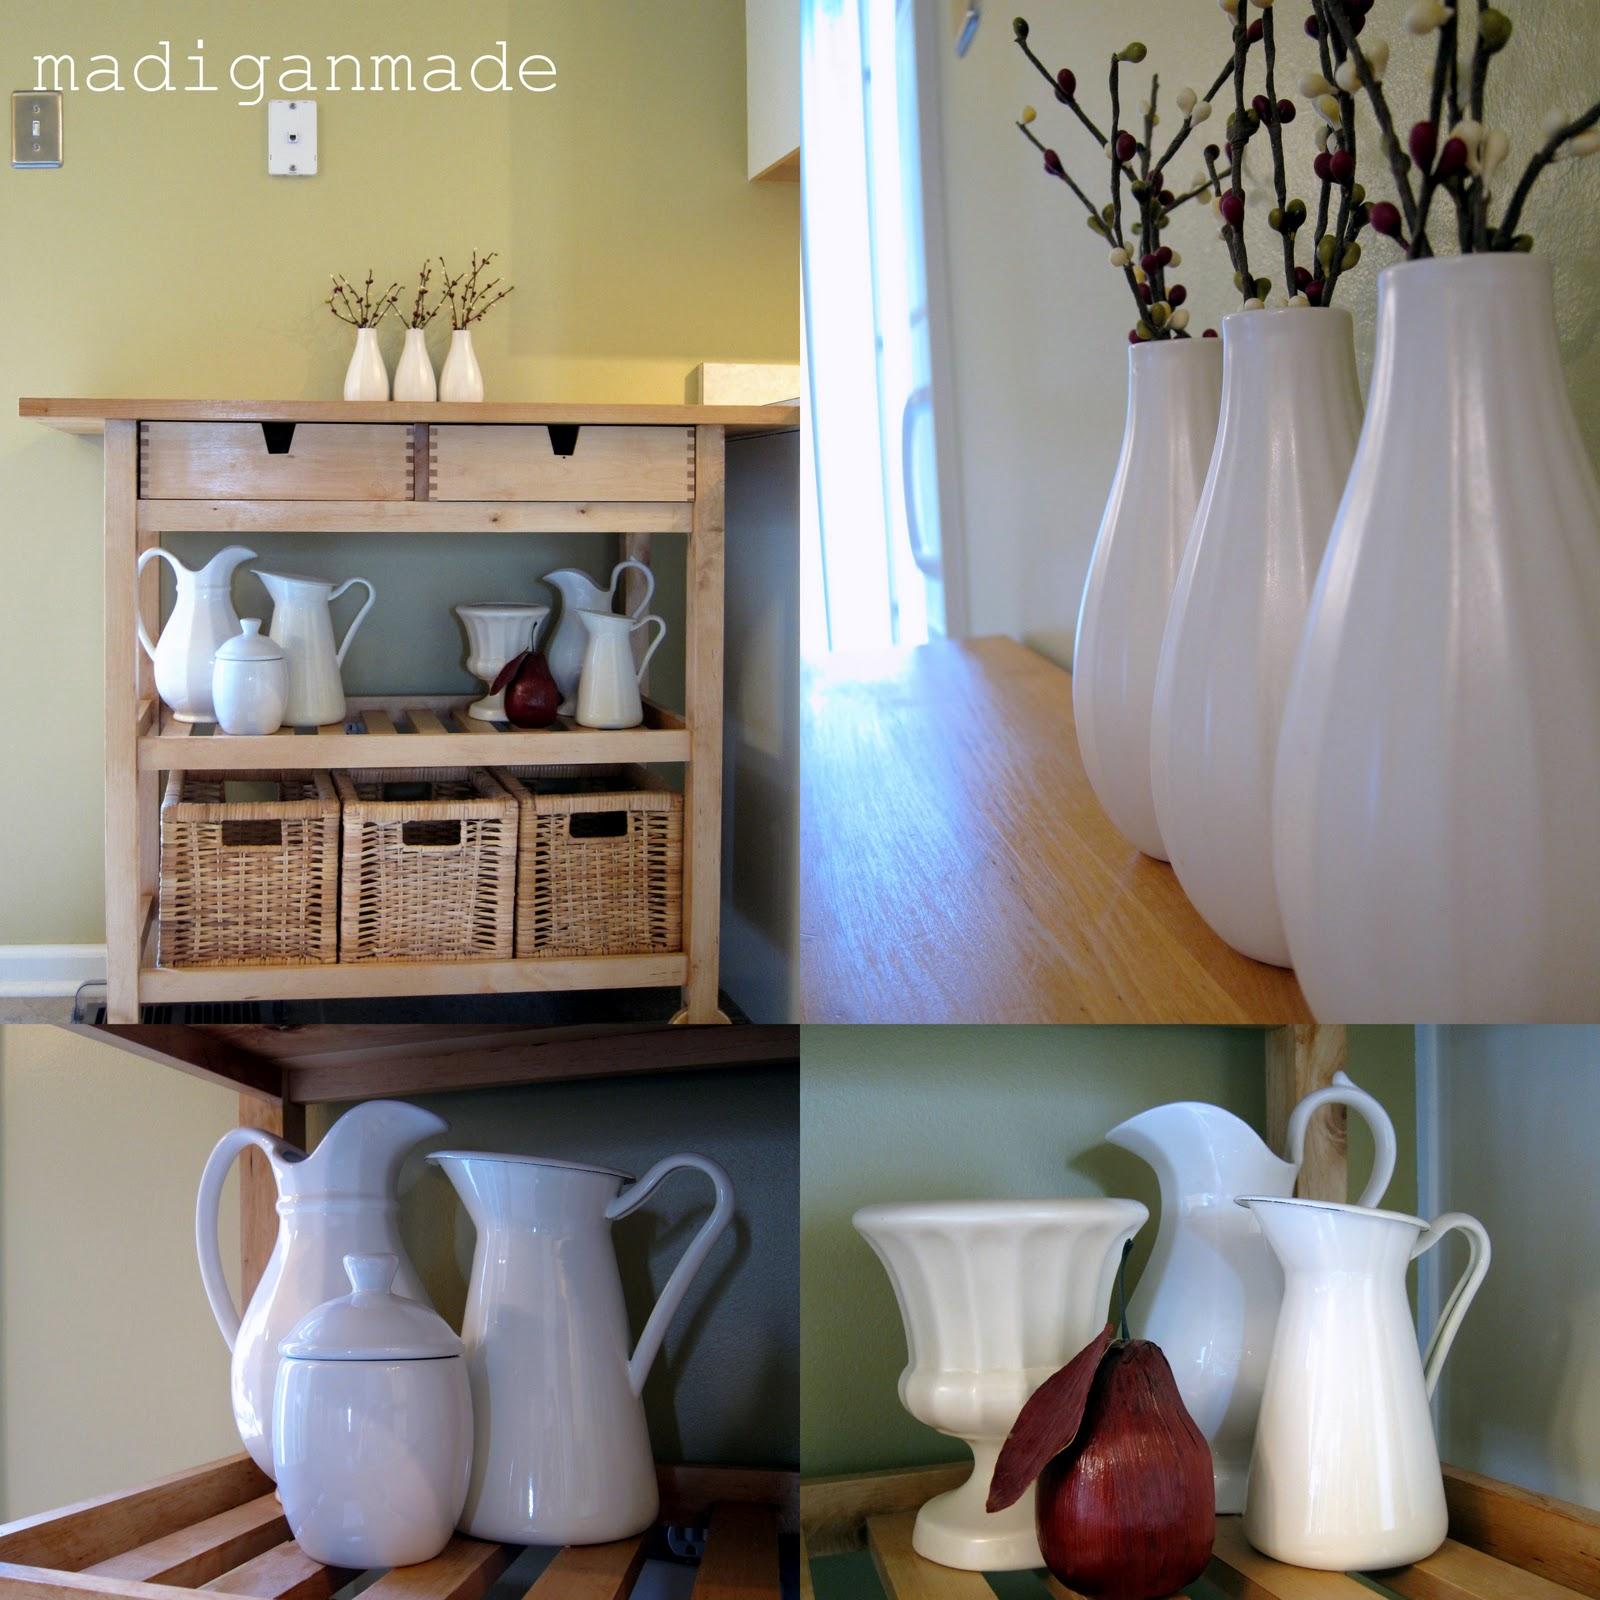 http://i1.wp.com/4.bp.blogspot.com/_xd5aEjCcjL4/TSCerHj51mI/AAAAAAAABVY/1UmOjYhWb7w/s1600/pottery.jpg?resize=533%2C533